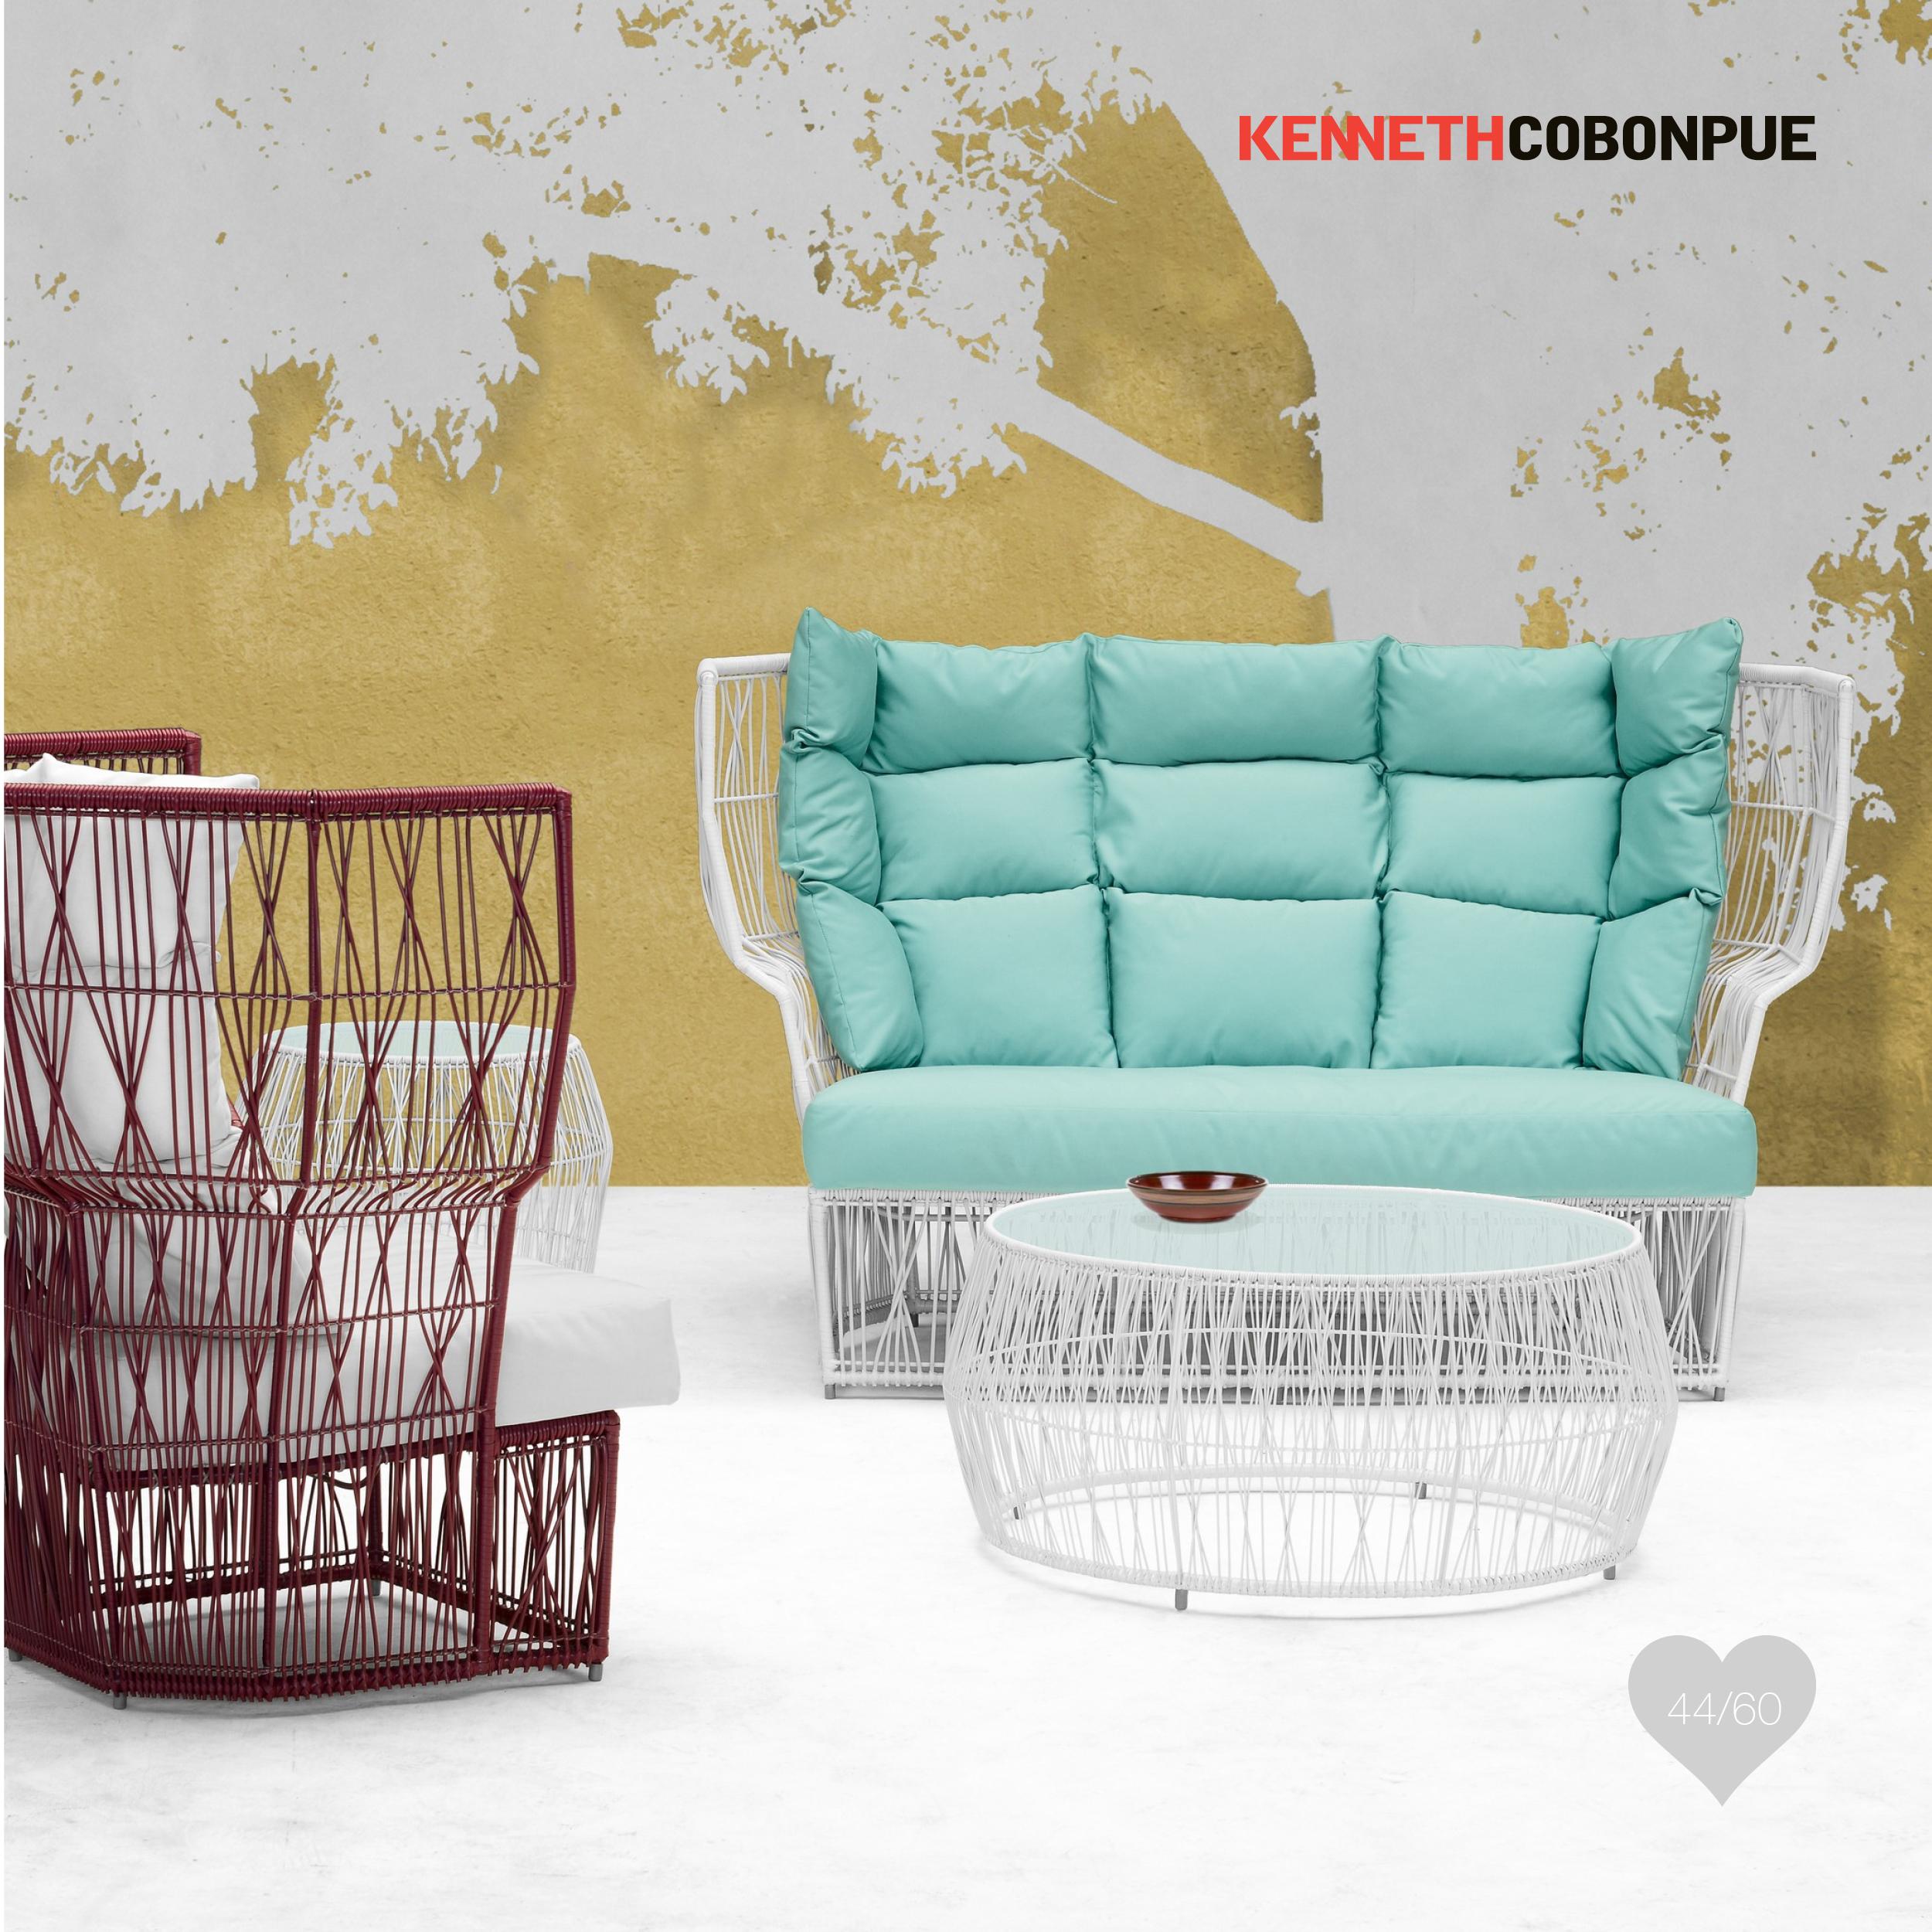 44_KE-ZU_KENNETH COBONPUE_CALYX